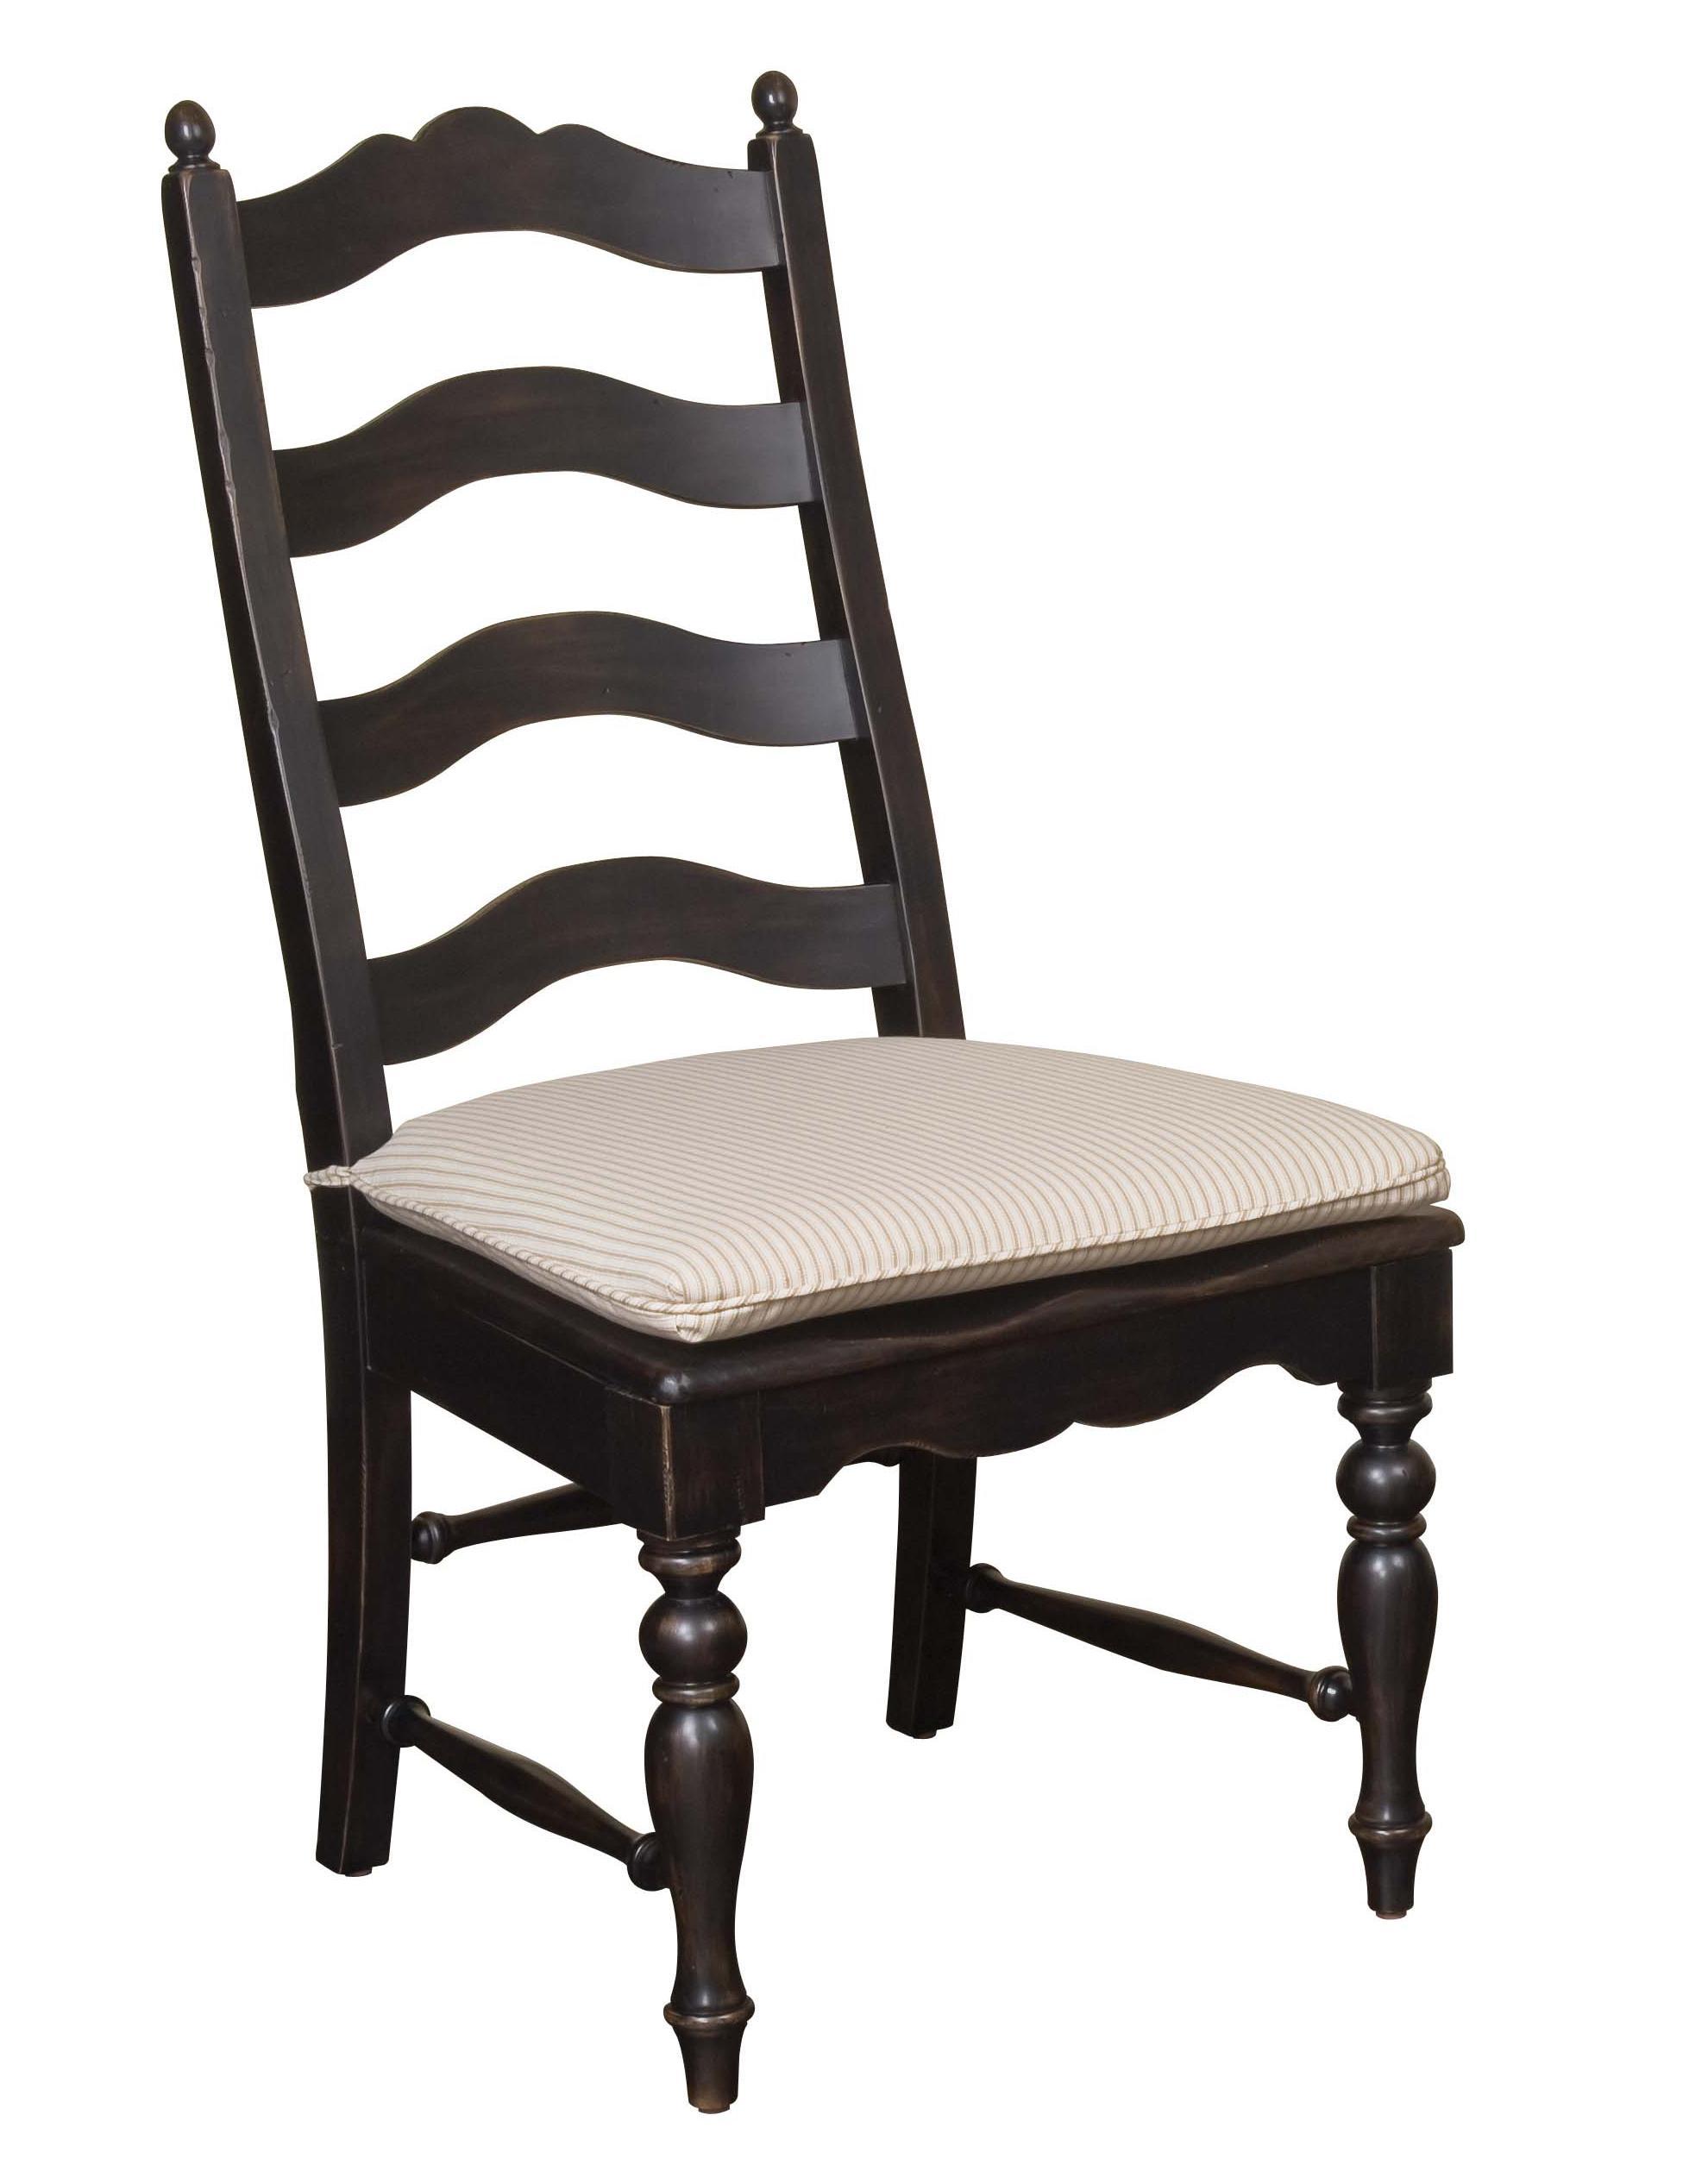 Kincaid Furniture Homecoming Ladderback Side Chair Black - Item Number: 33-061B